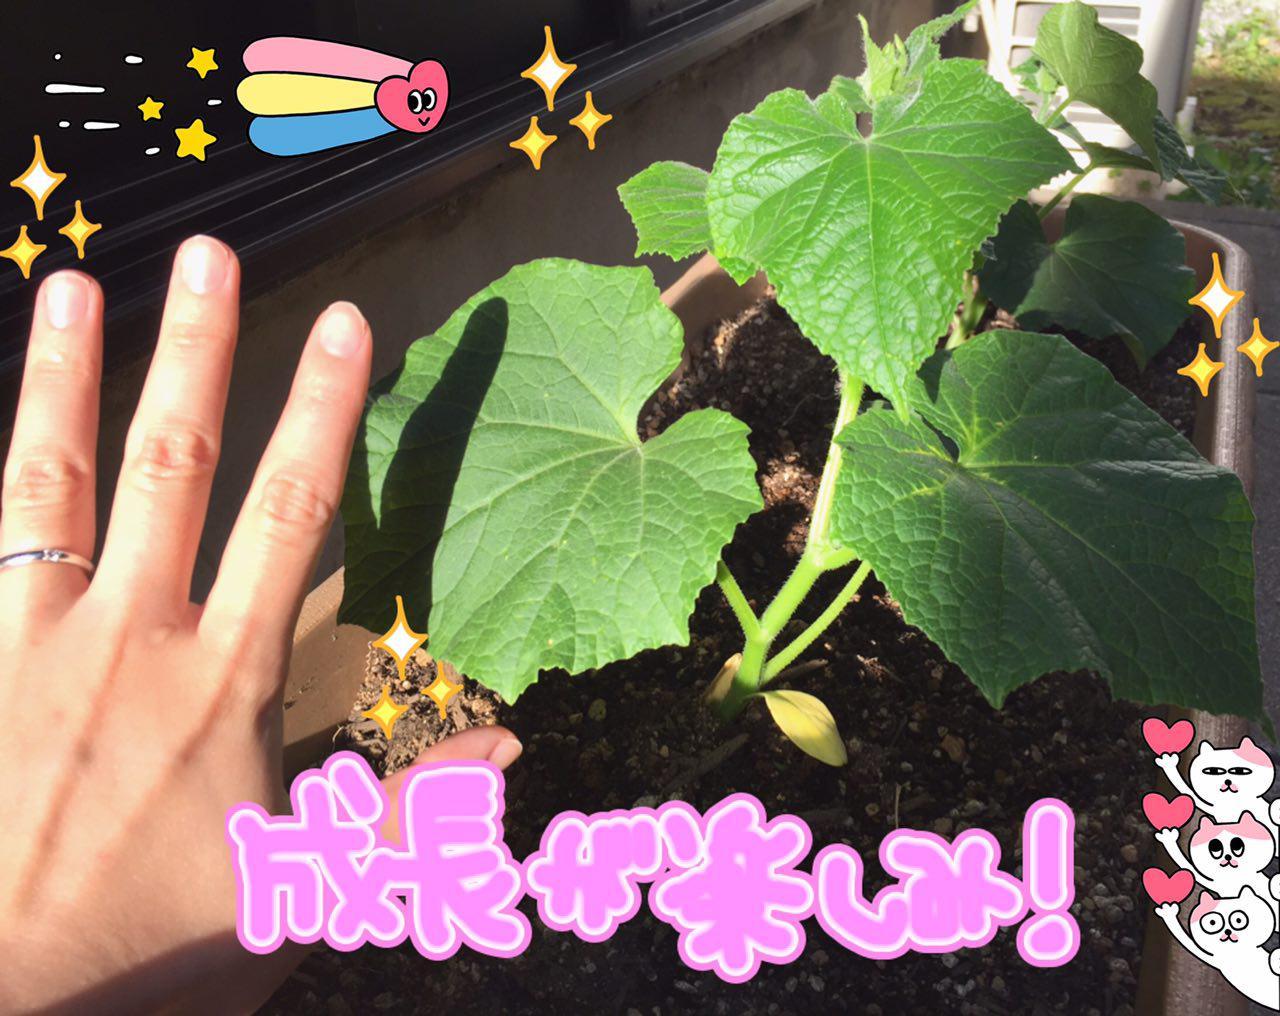 photo_2017-05-24_00-06-49.jpg